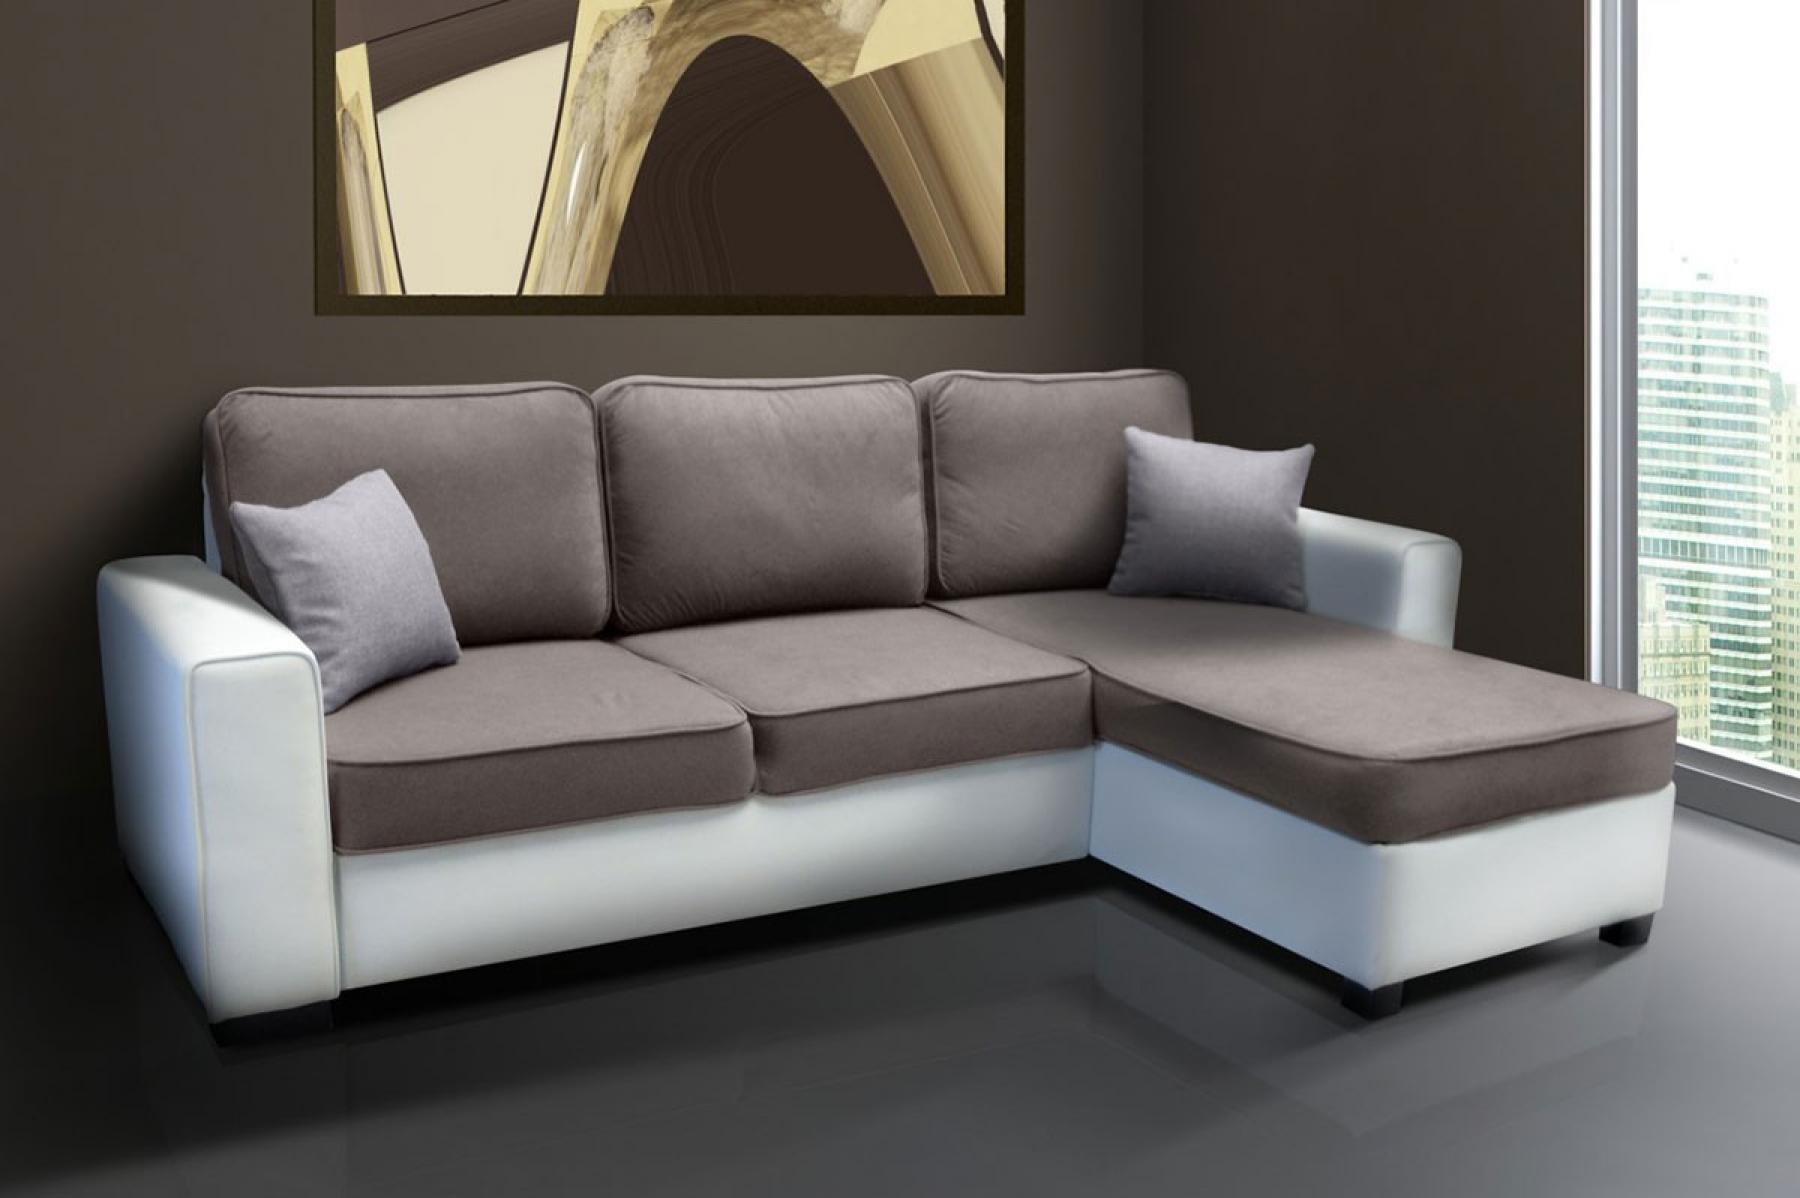 photos canap microfibre convertible. Black Bedroom Furniture Sets. Home Design Ideas